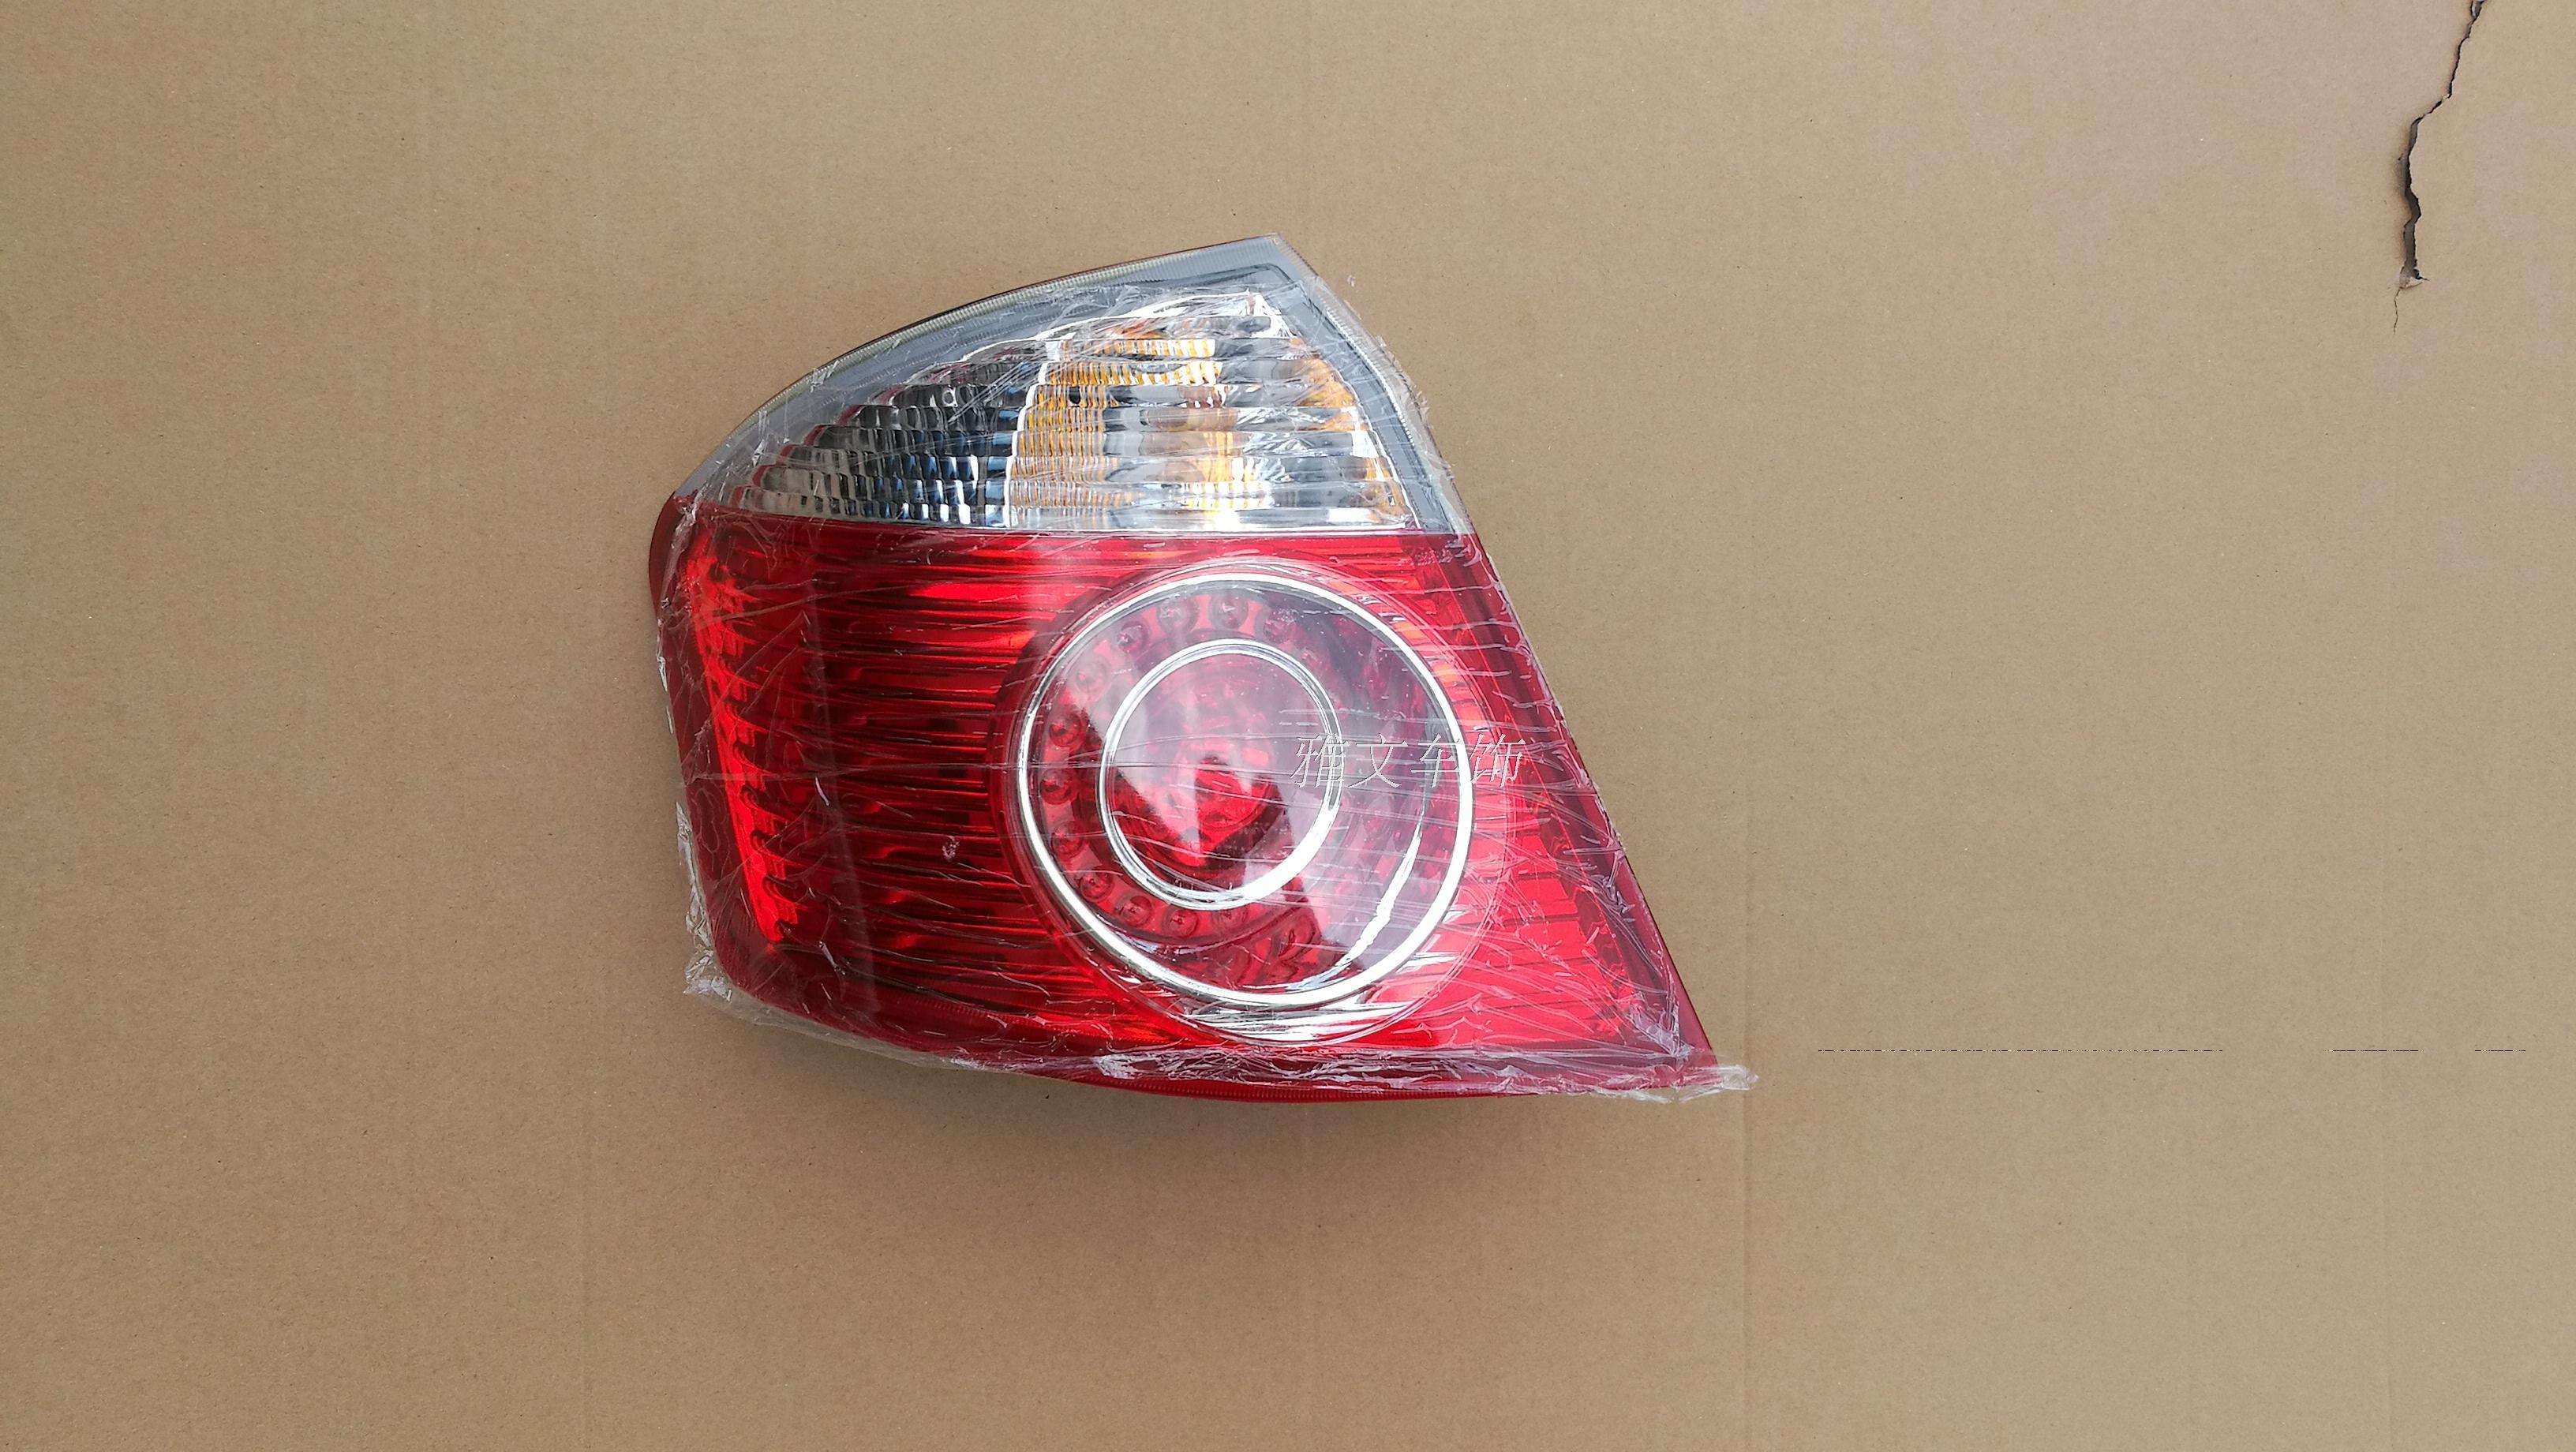 lightbox moreview · lightbox moreview ...